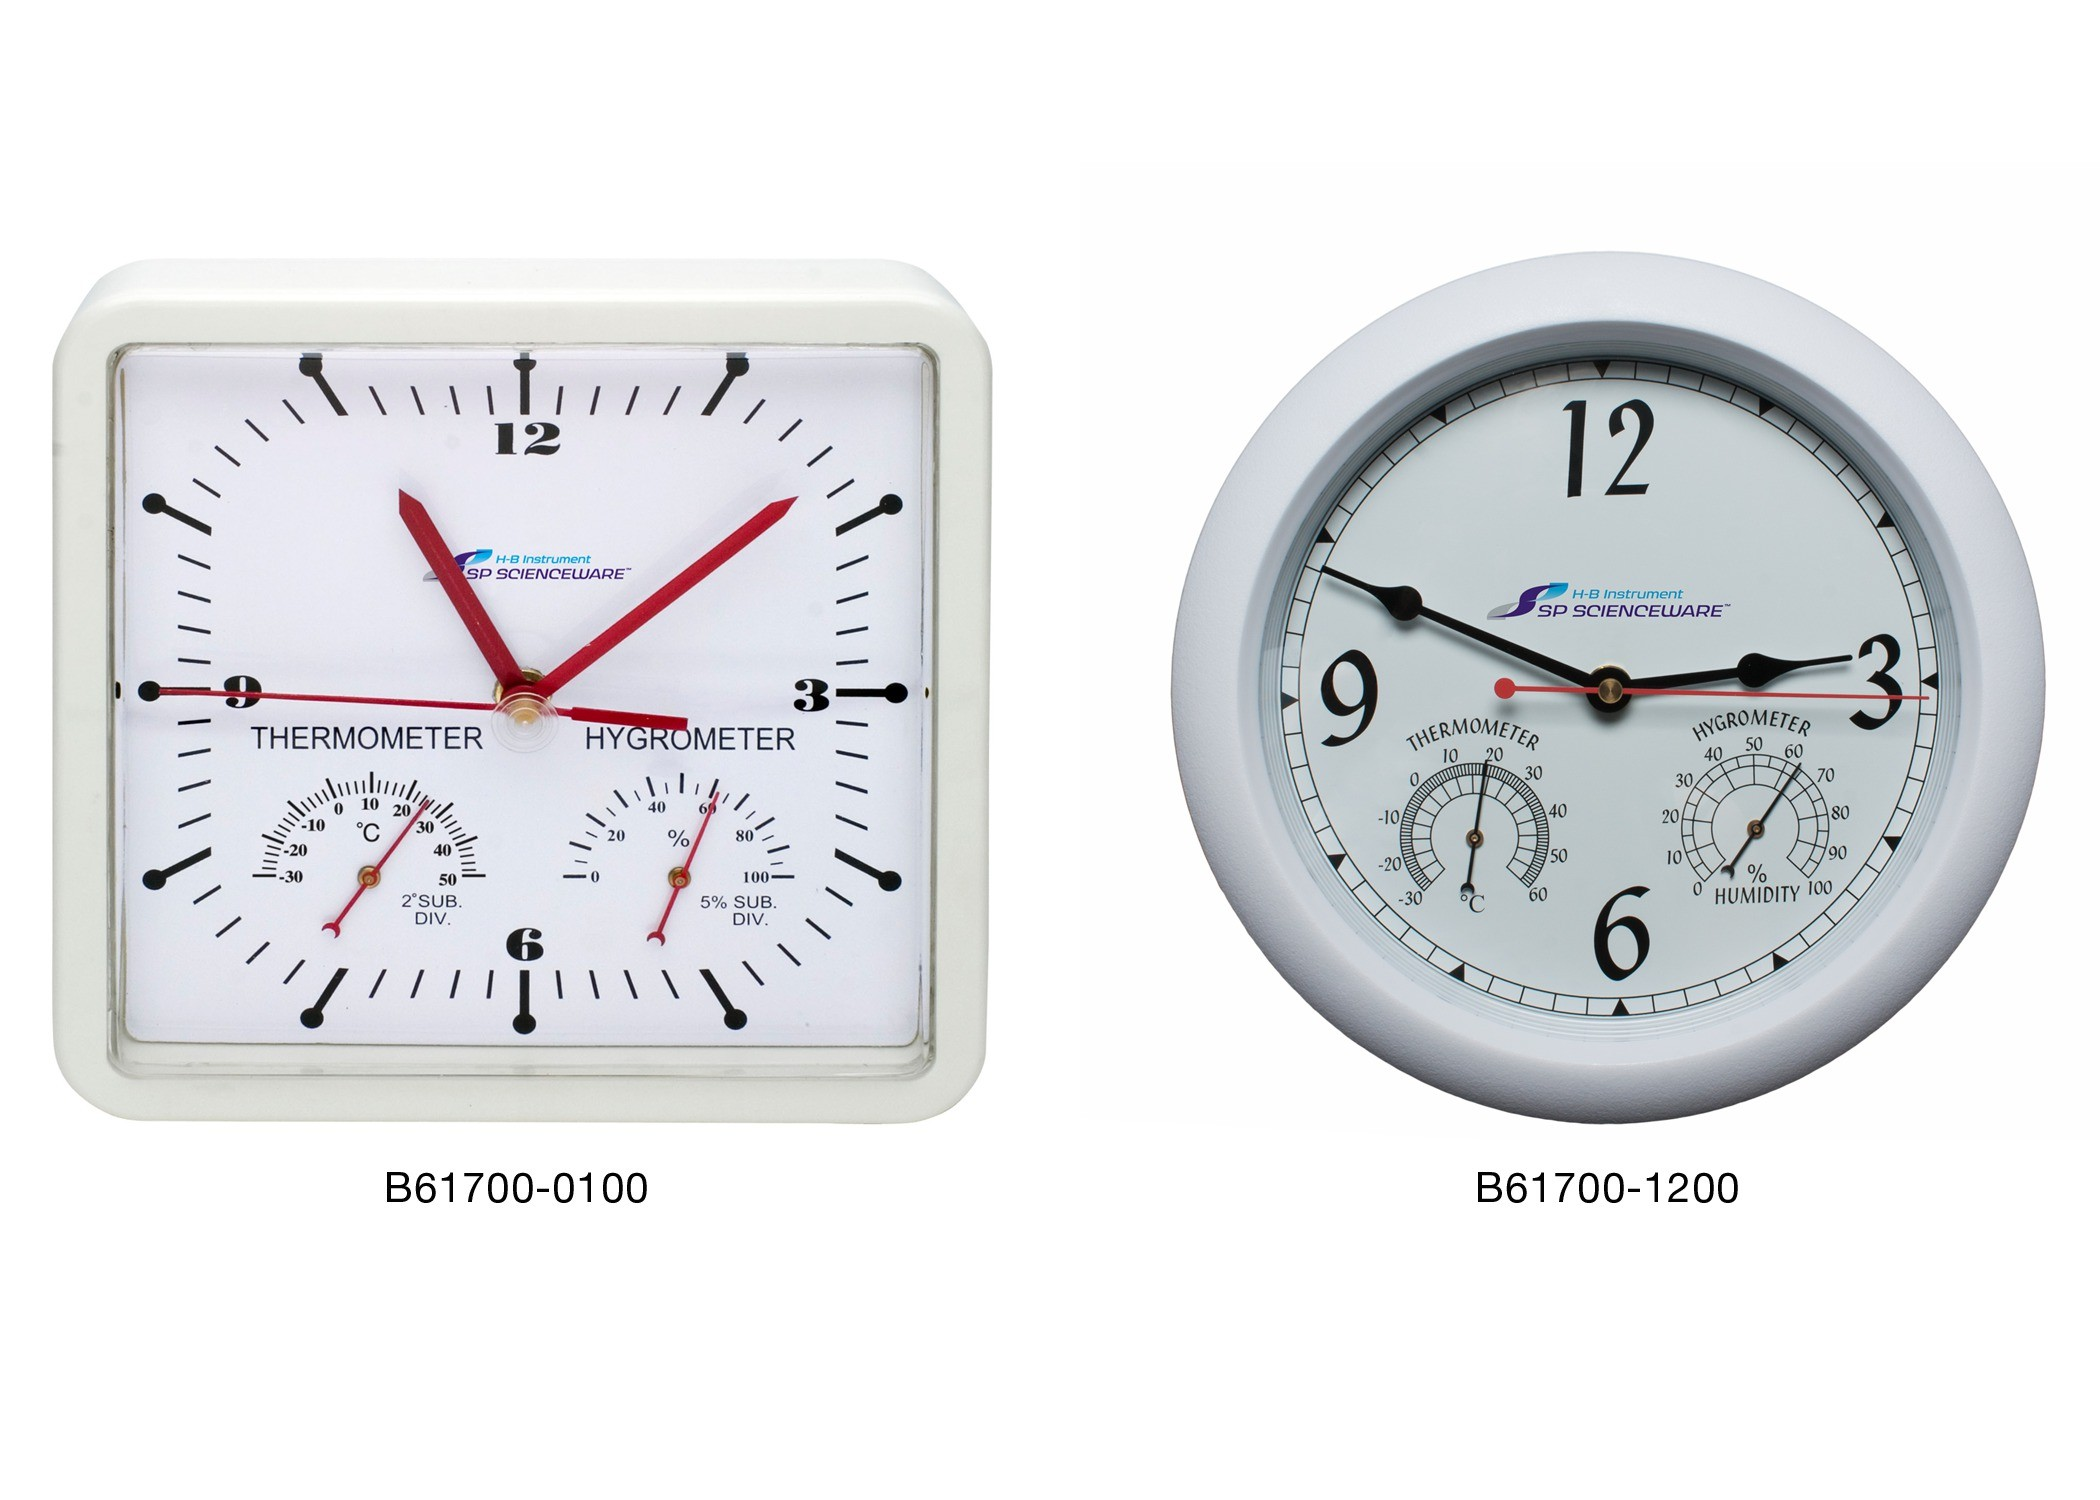 H-B DURAC Thermometer-Hygrometer Clocks